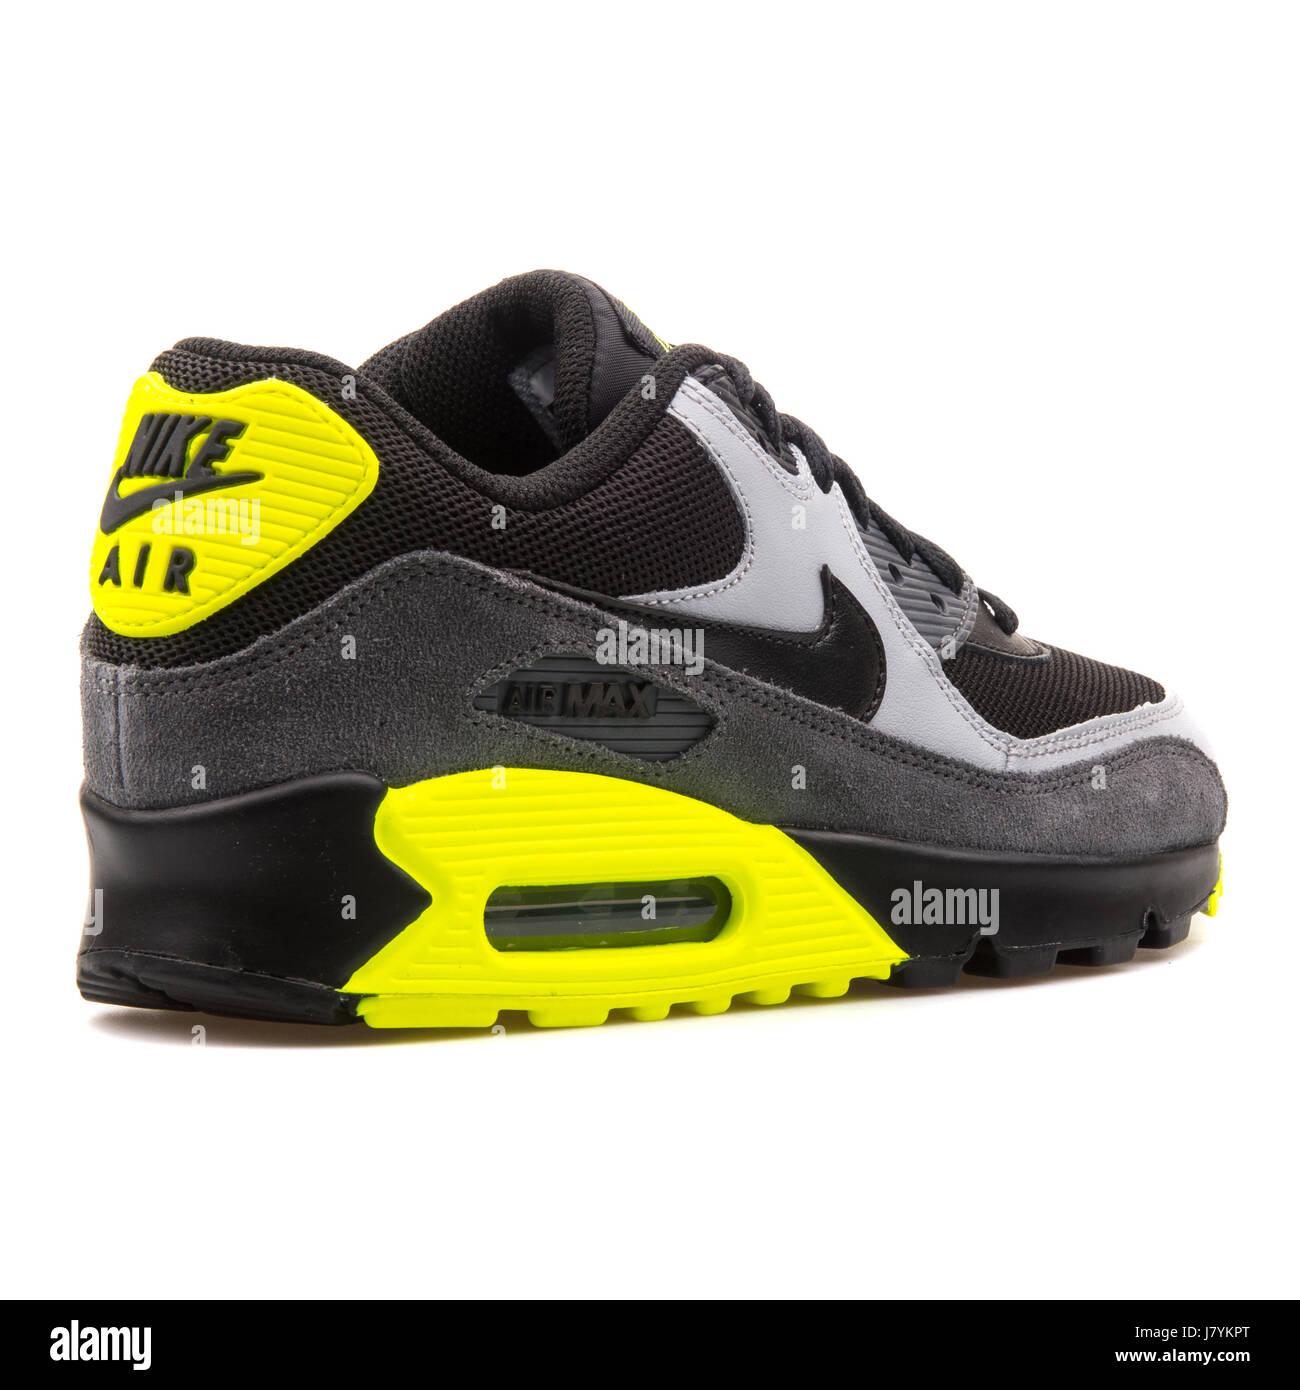 new concept 5578e 971eb Nike Air Max 90 Mesh (GS) Jugend schwarz grau und gelb Leder-Sneakers